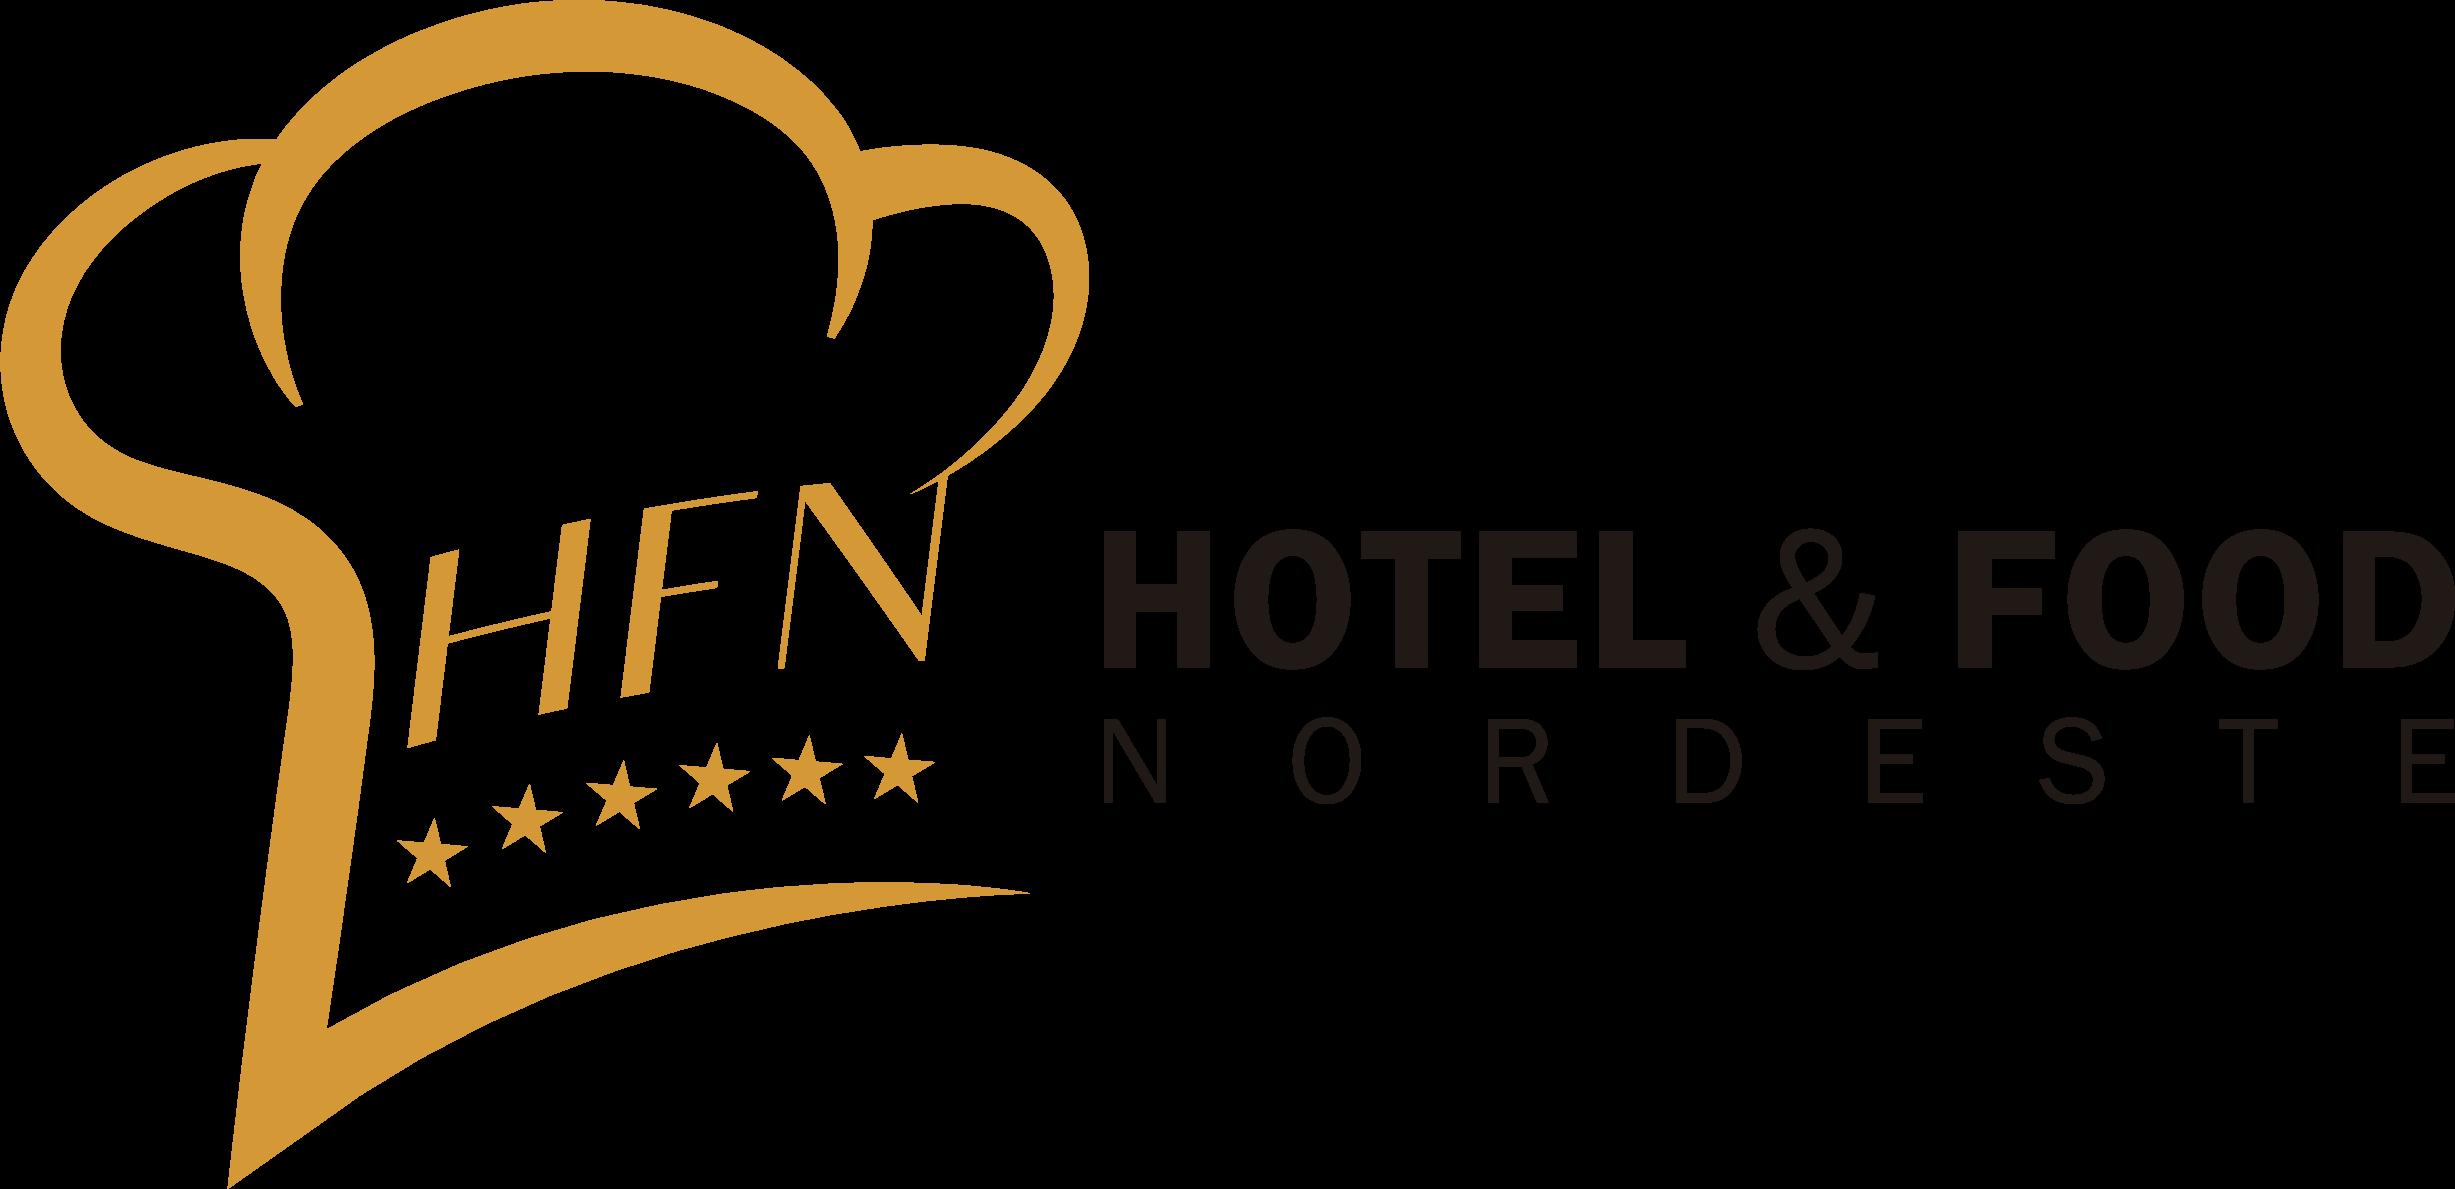 HFN - HOTEL & FOOD NORDESTE